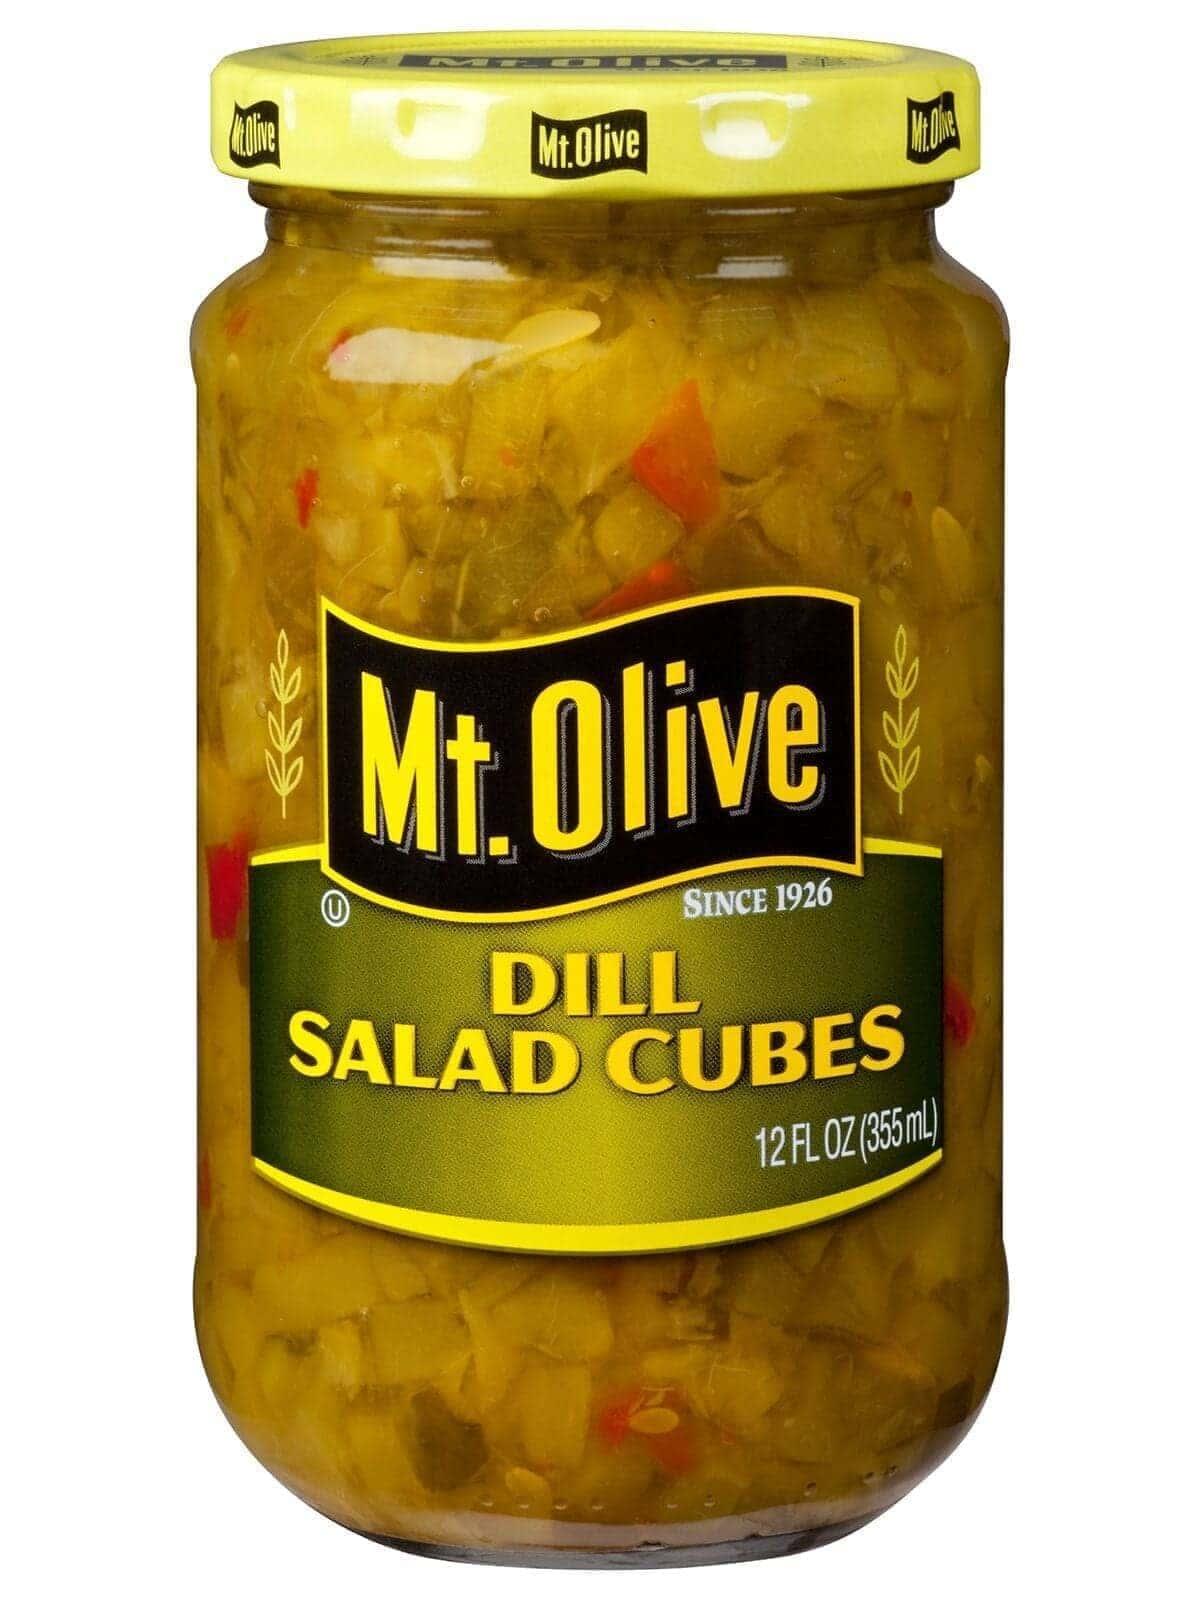 Dill Salad Cubes Jar